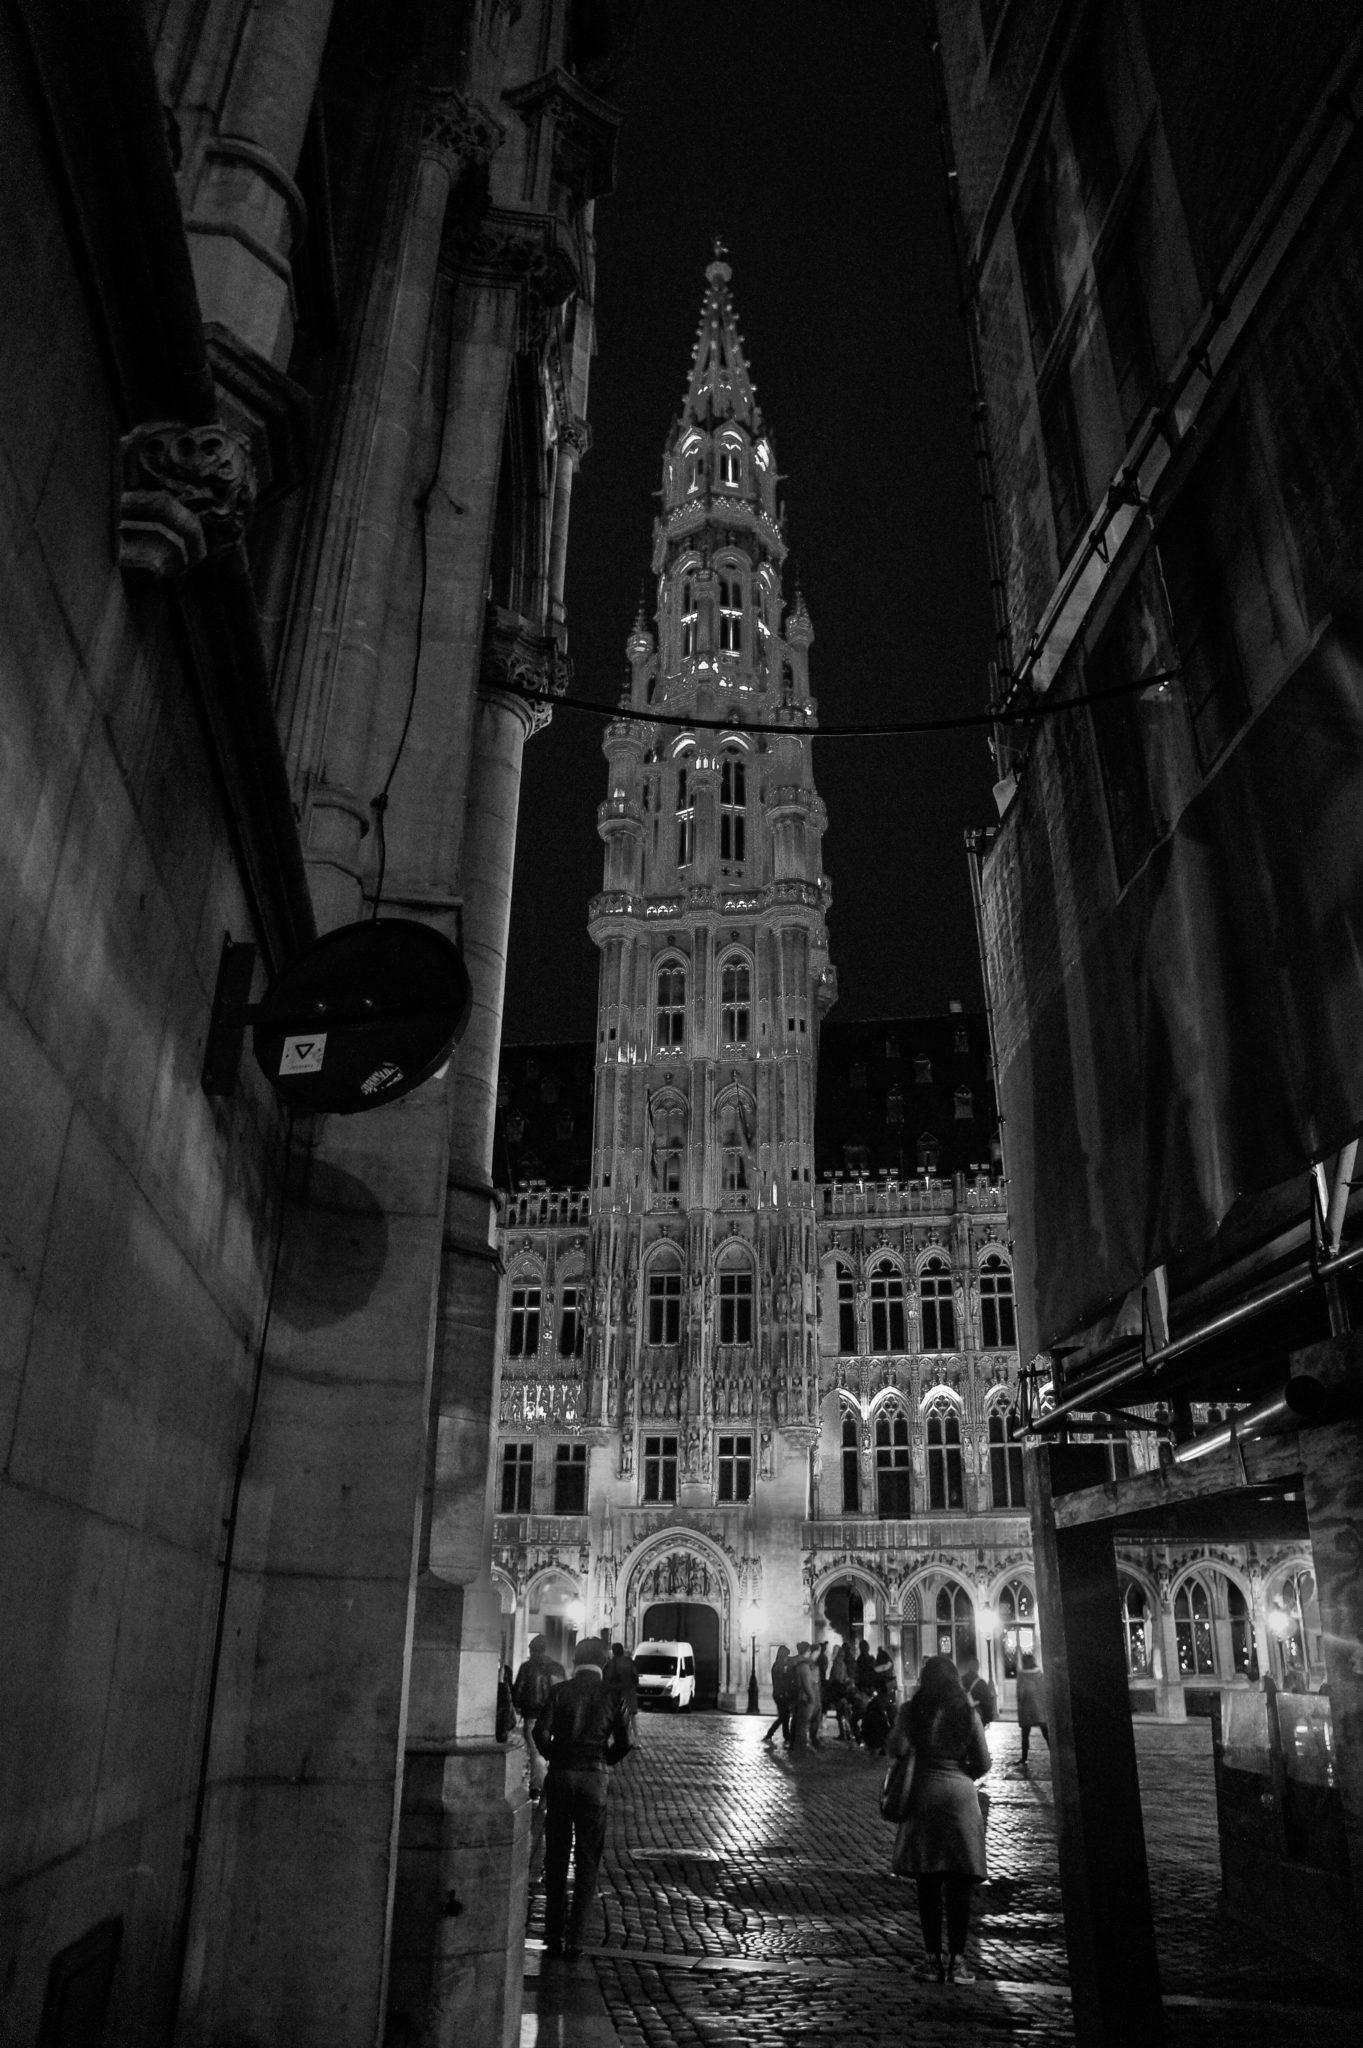 Hema_Bruxelles_Mairie_Nuit_Noir_Blanc